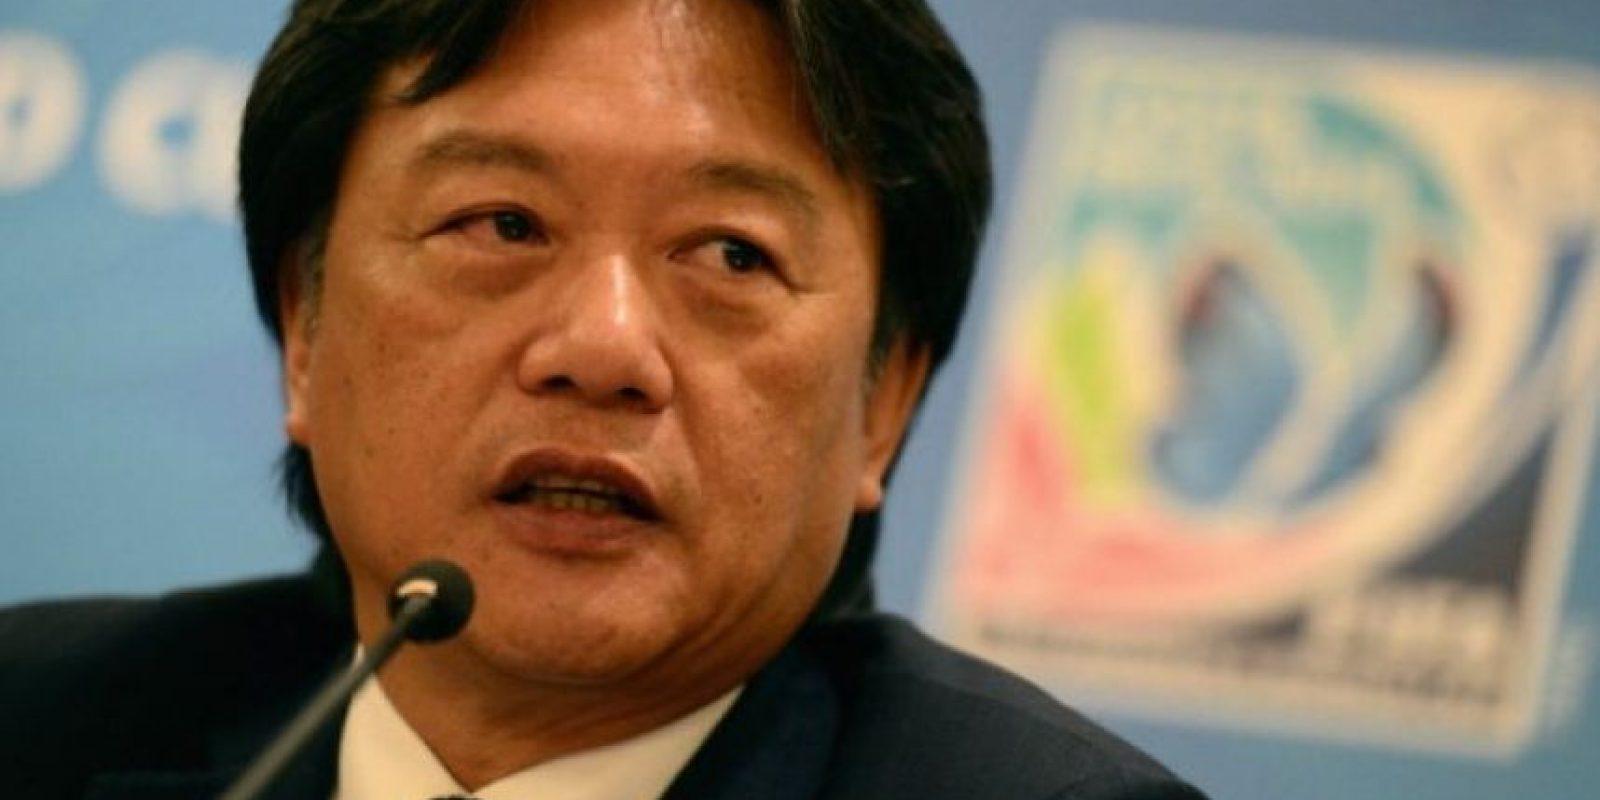 Eduardo Li, actual miembro electo del Comité Ejecutivo de la FIFA. Foto:Getty Images